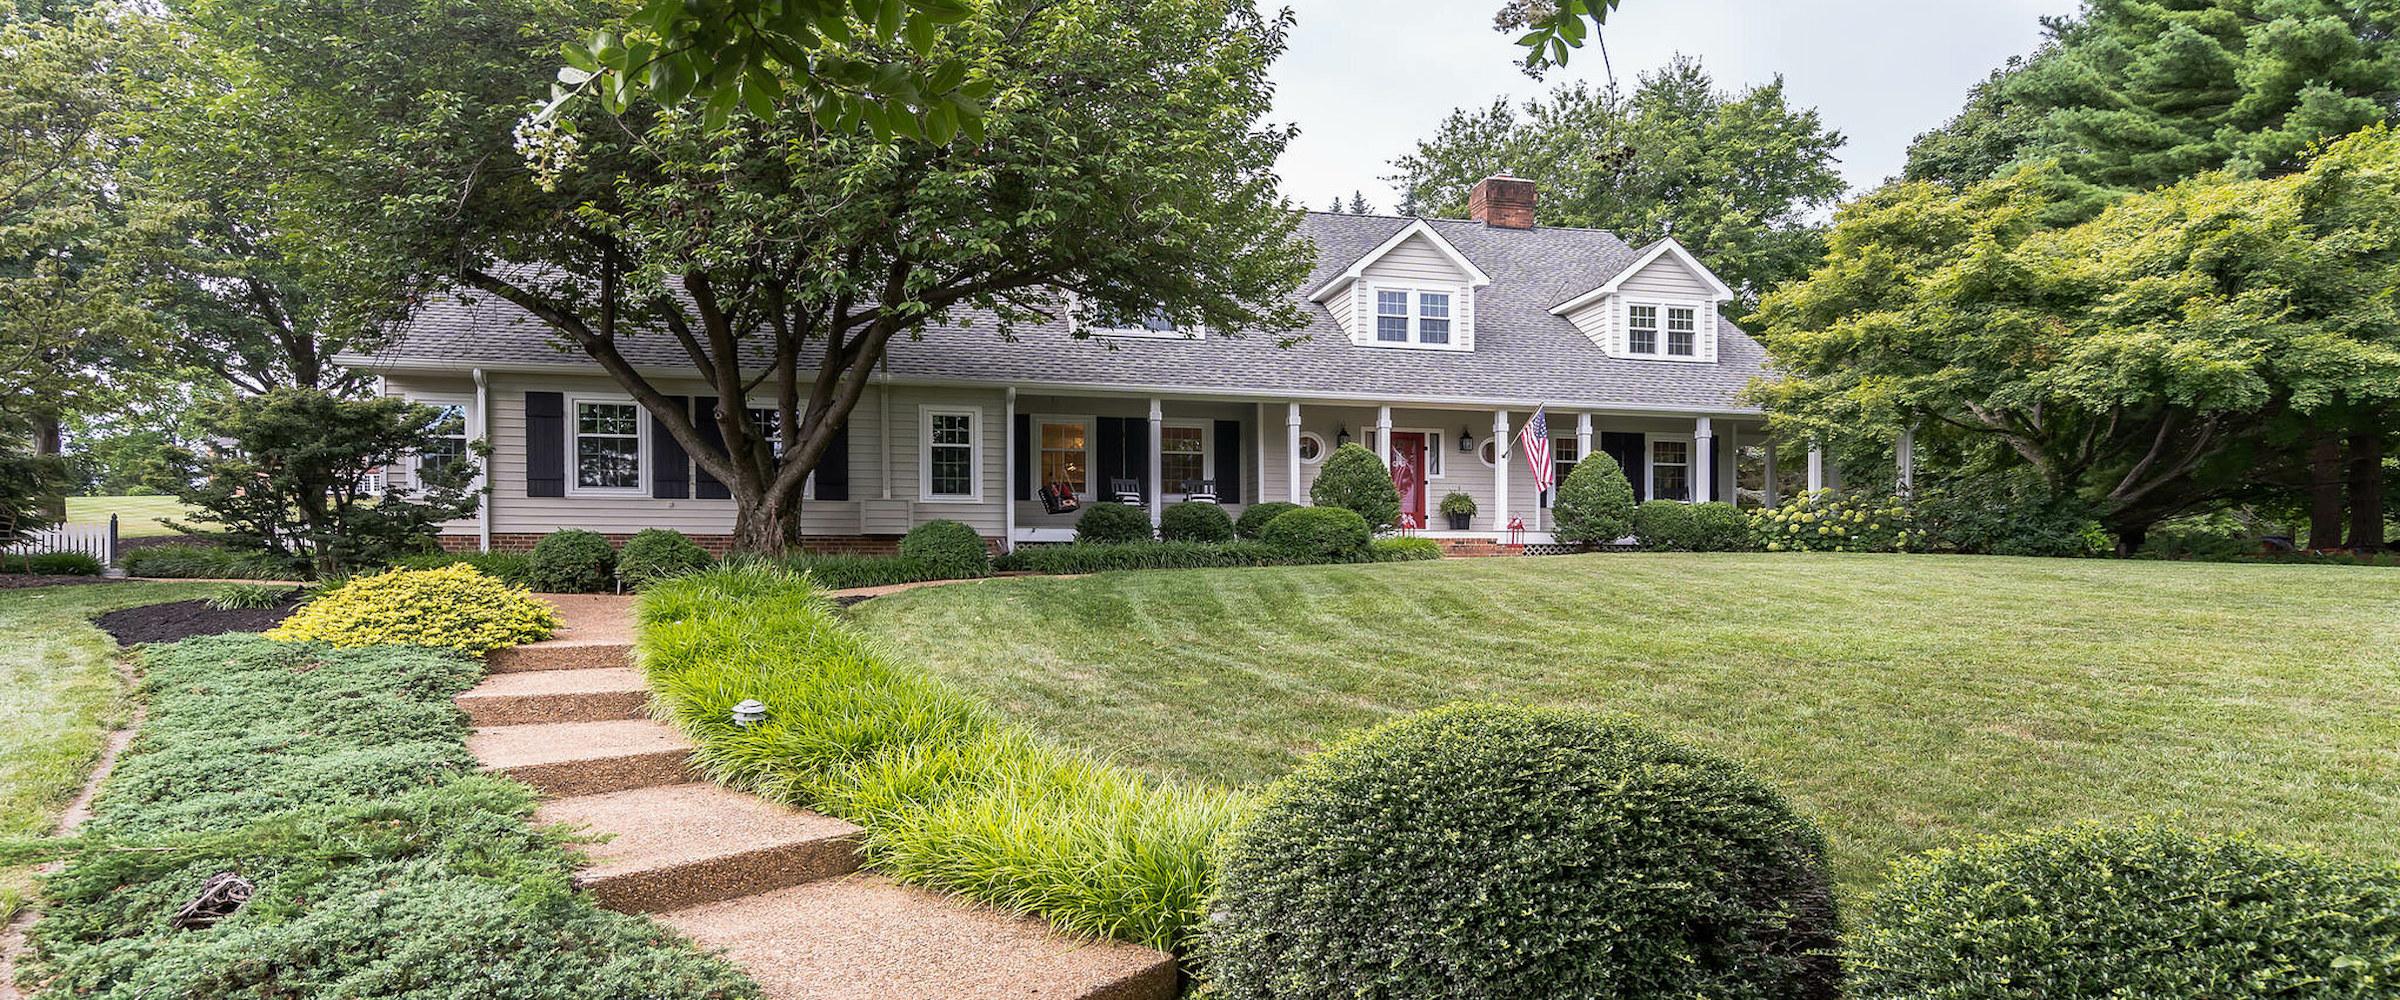 Houwzer home in Baltimore